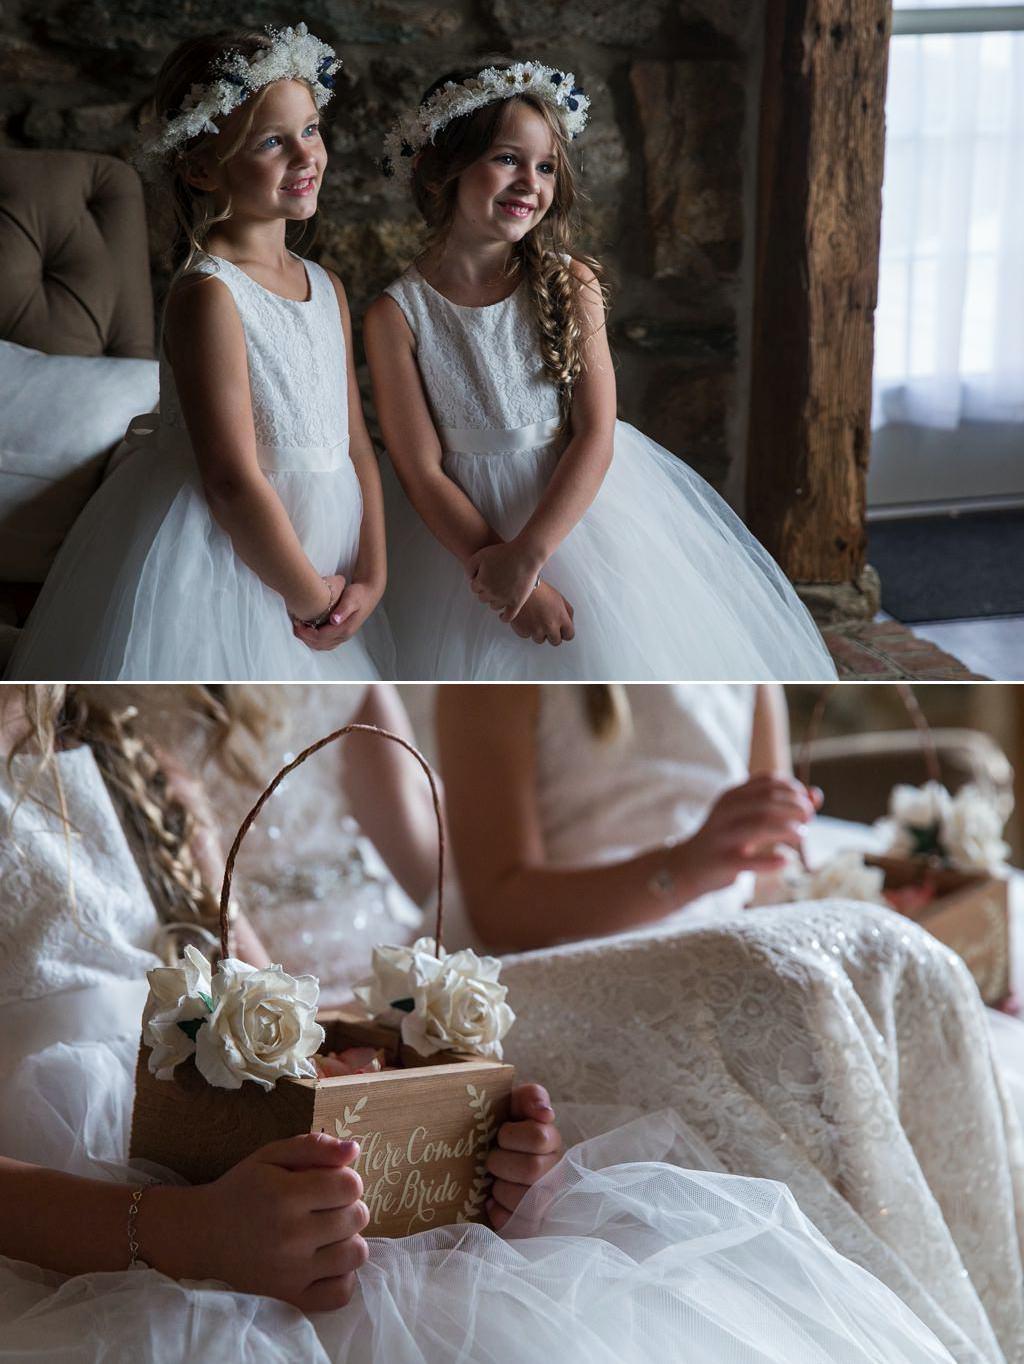 Flower girls posing in the bridal suite of Wyndridge Farm